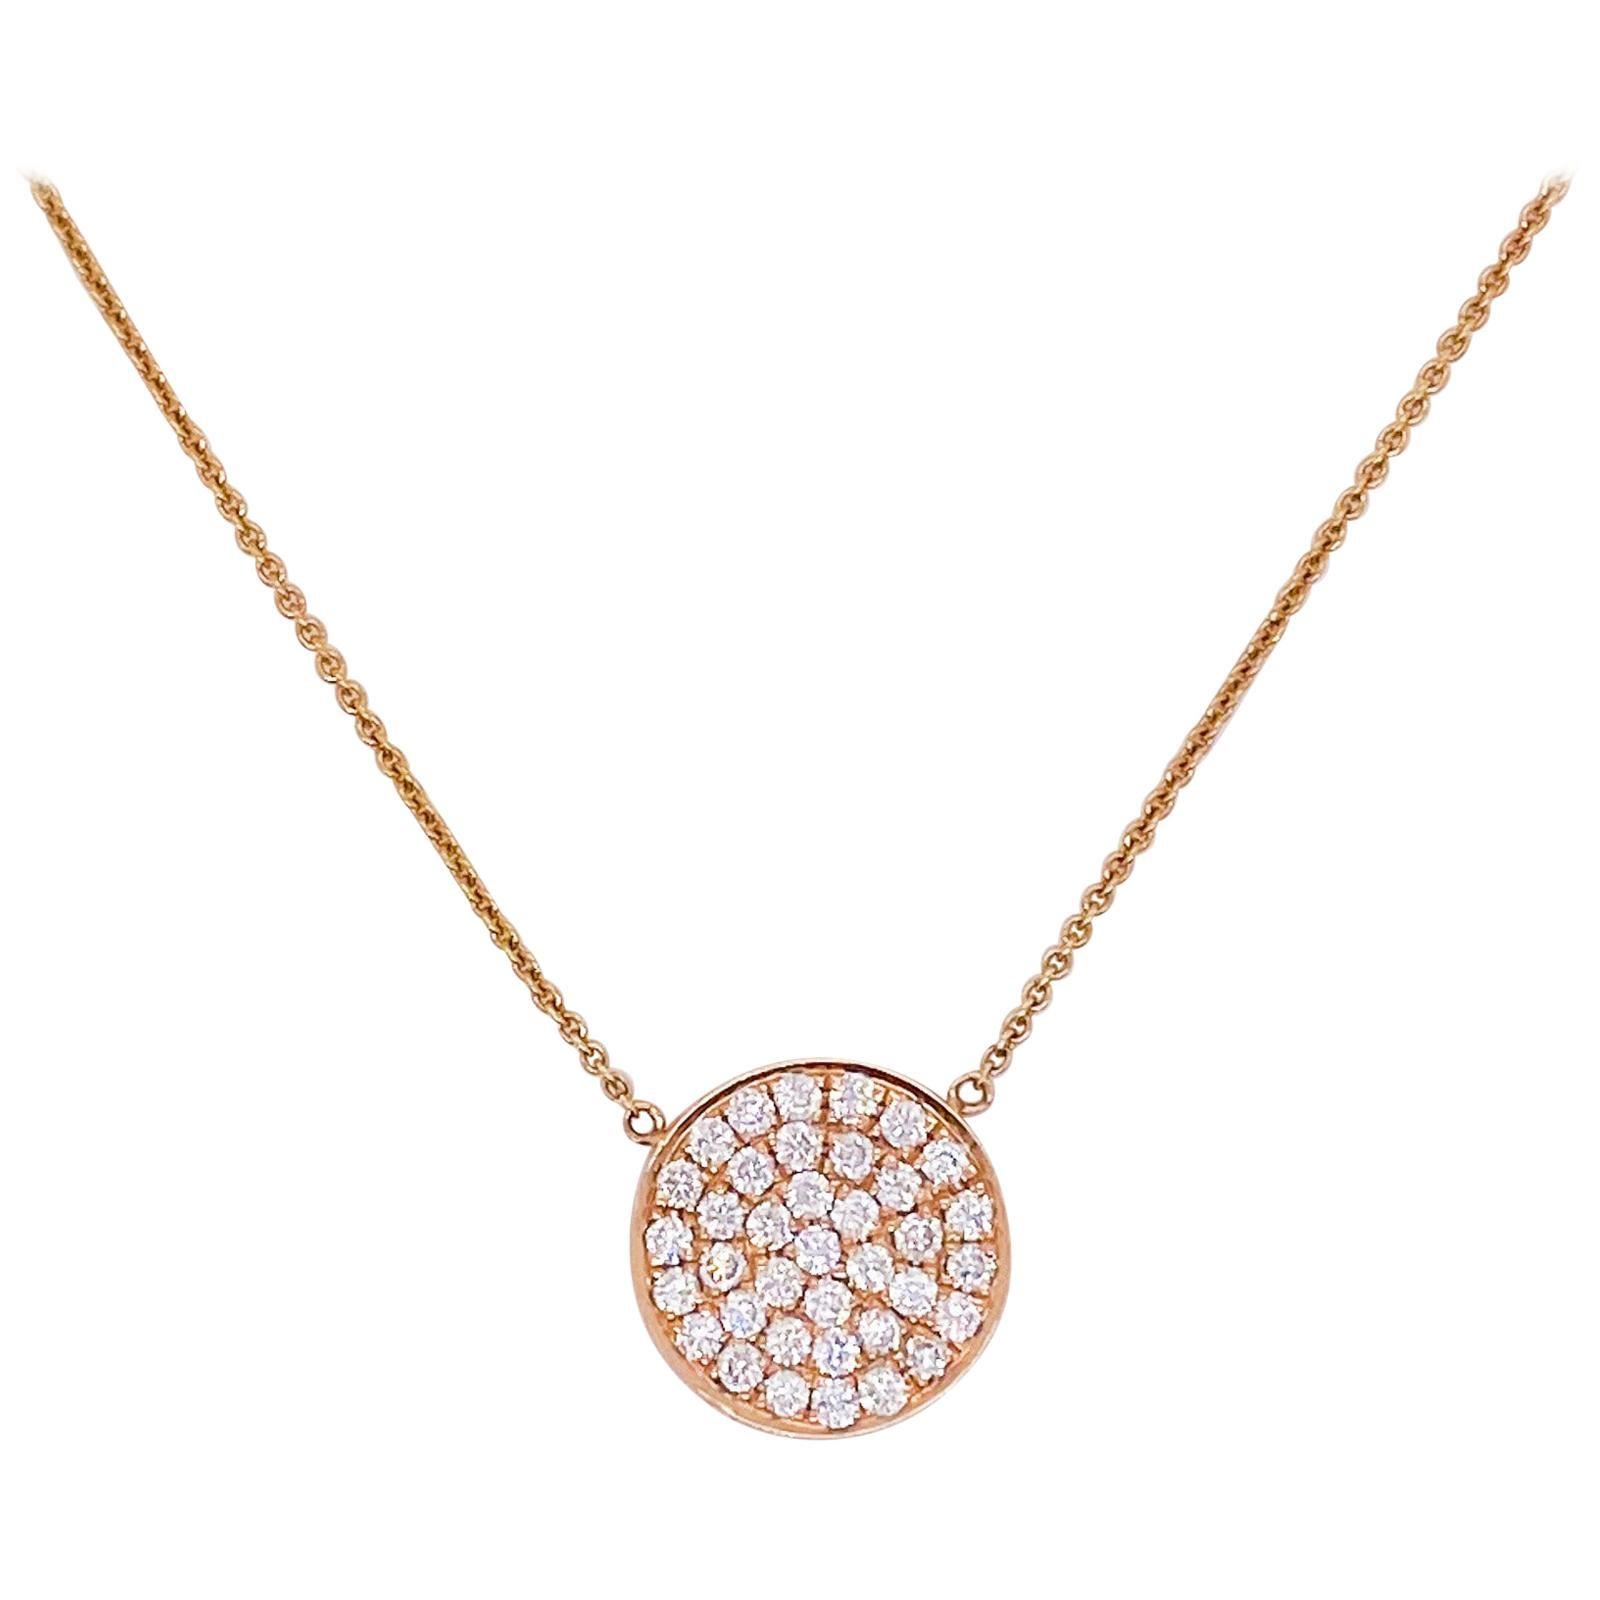 Pave Diamond Disk Rose Gold Necklace 14 Karat Gold 1/2 Carat Diamond Pendant